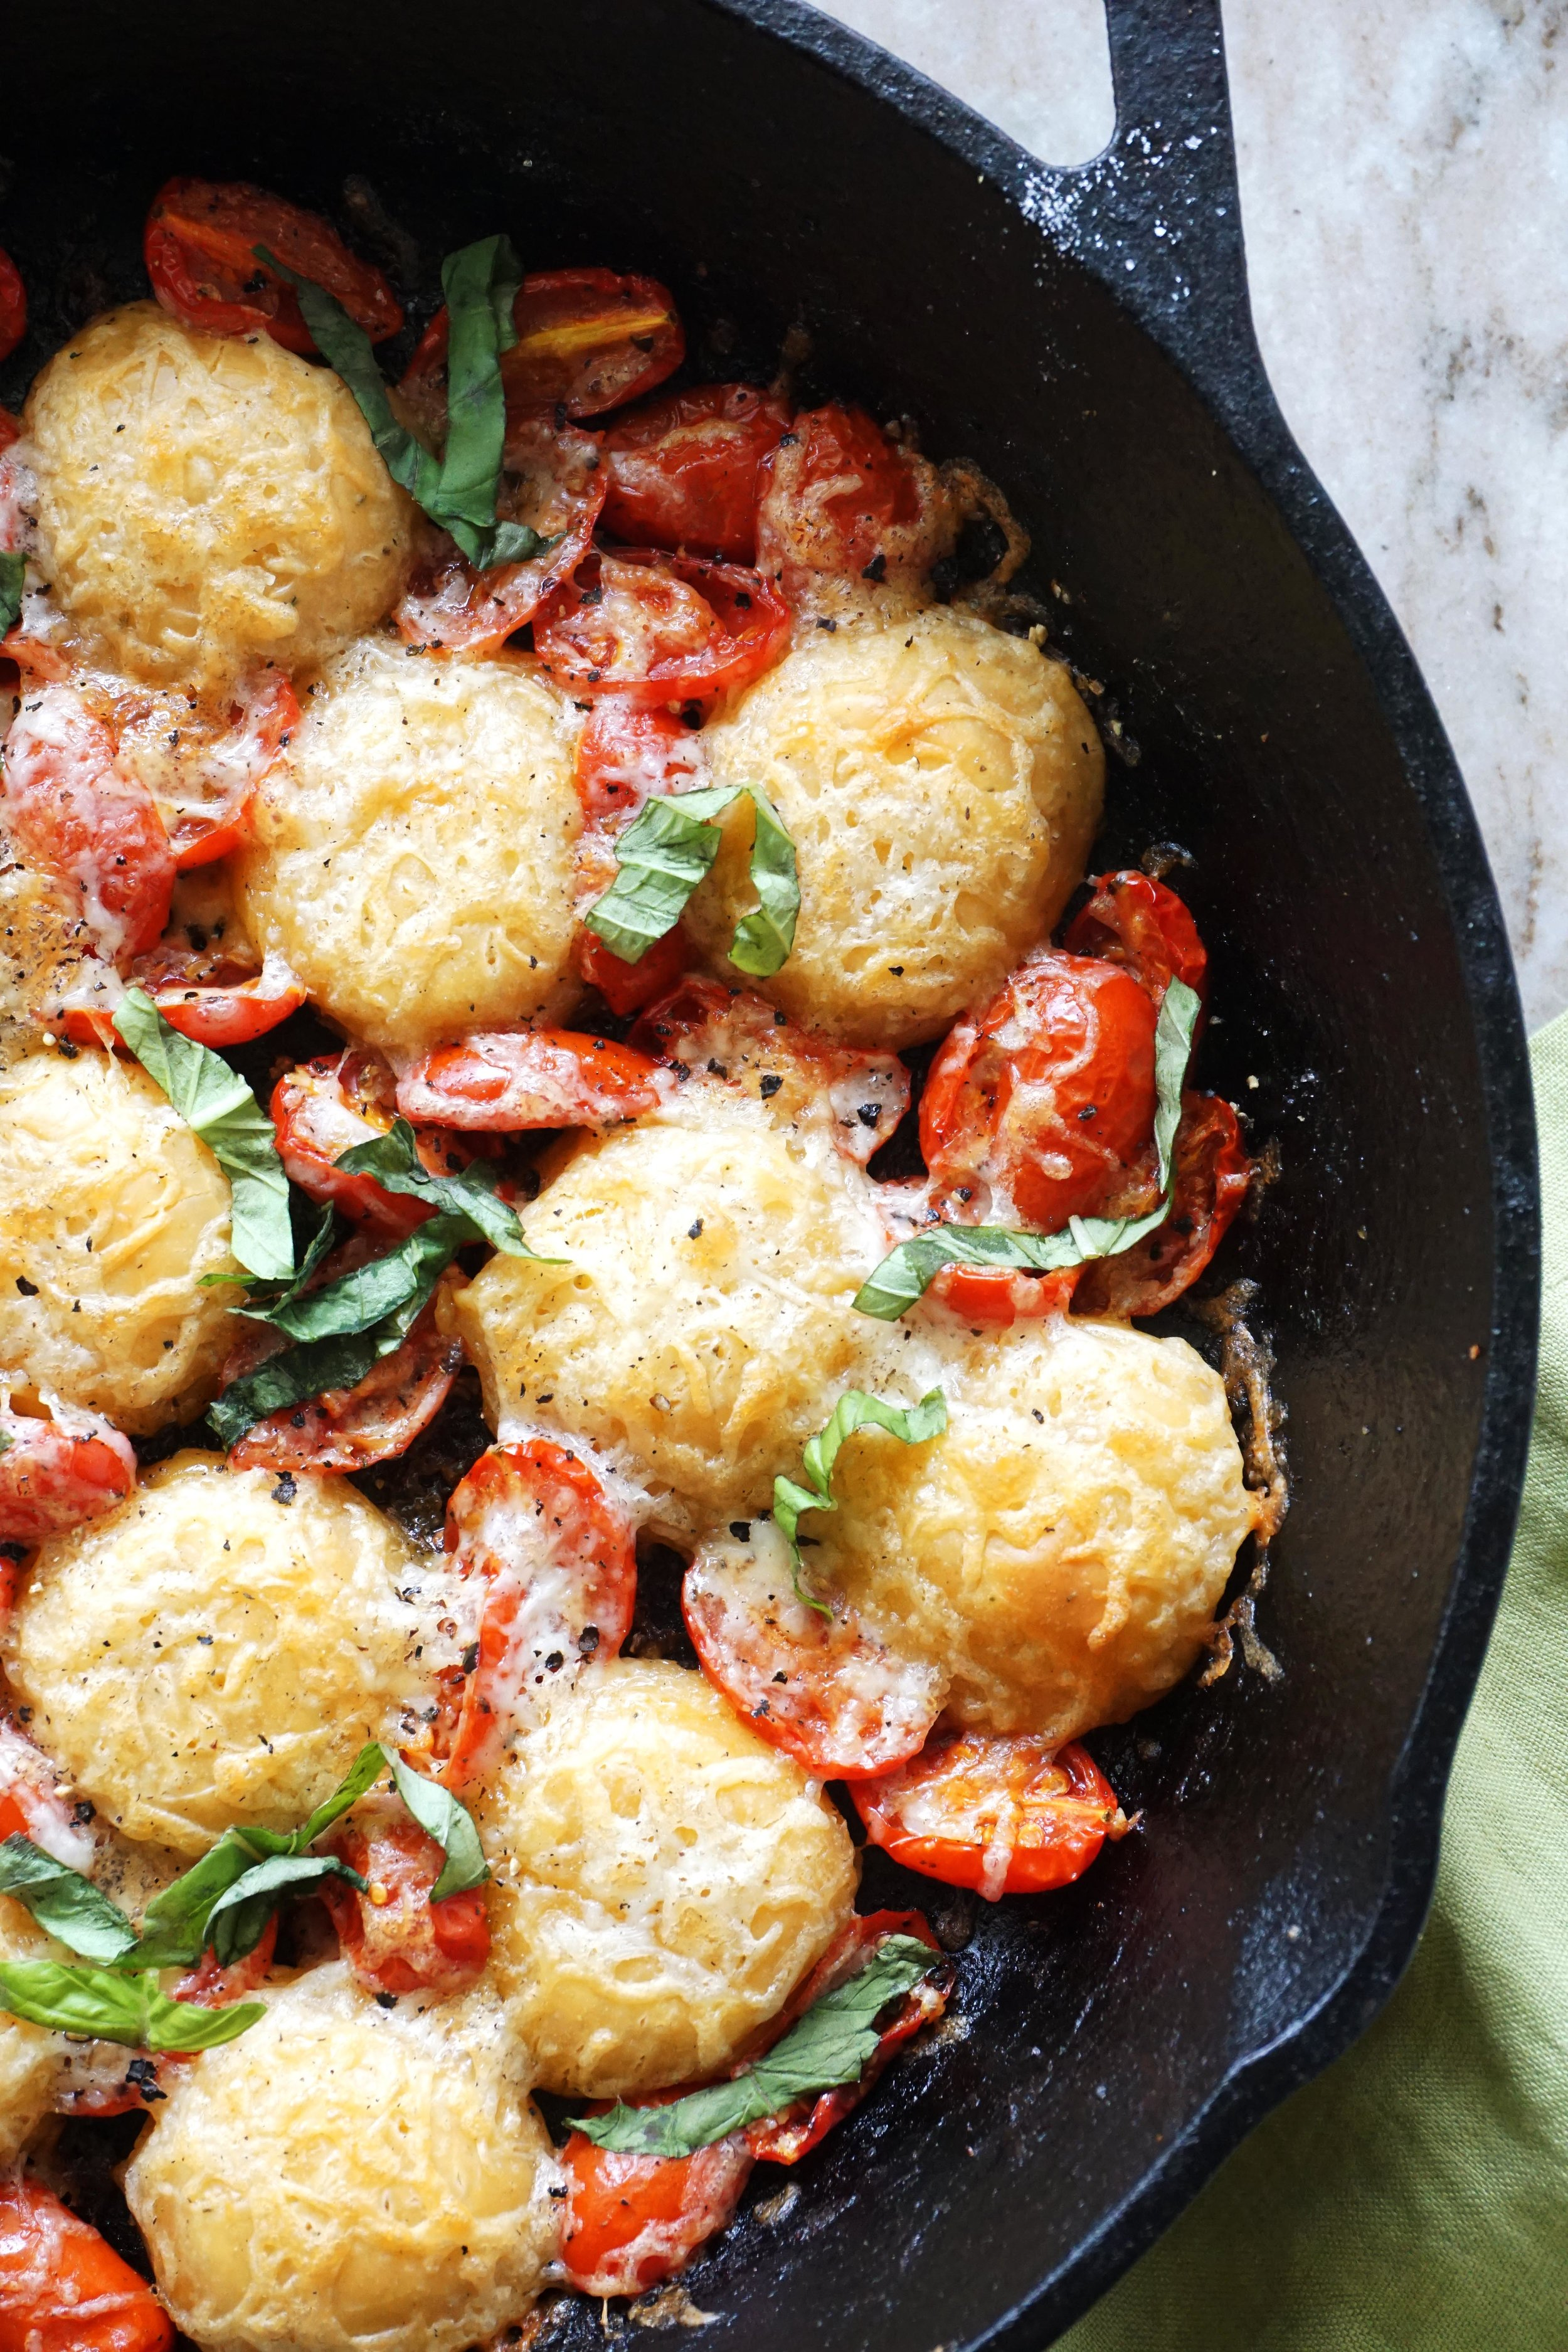 Tomato Basil Skillet Pizza Bites (GF)